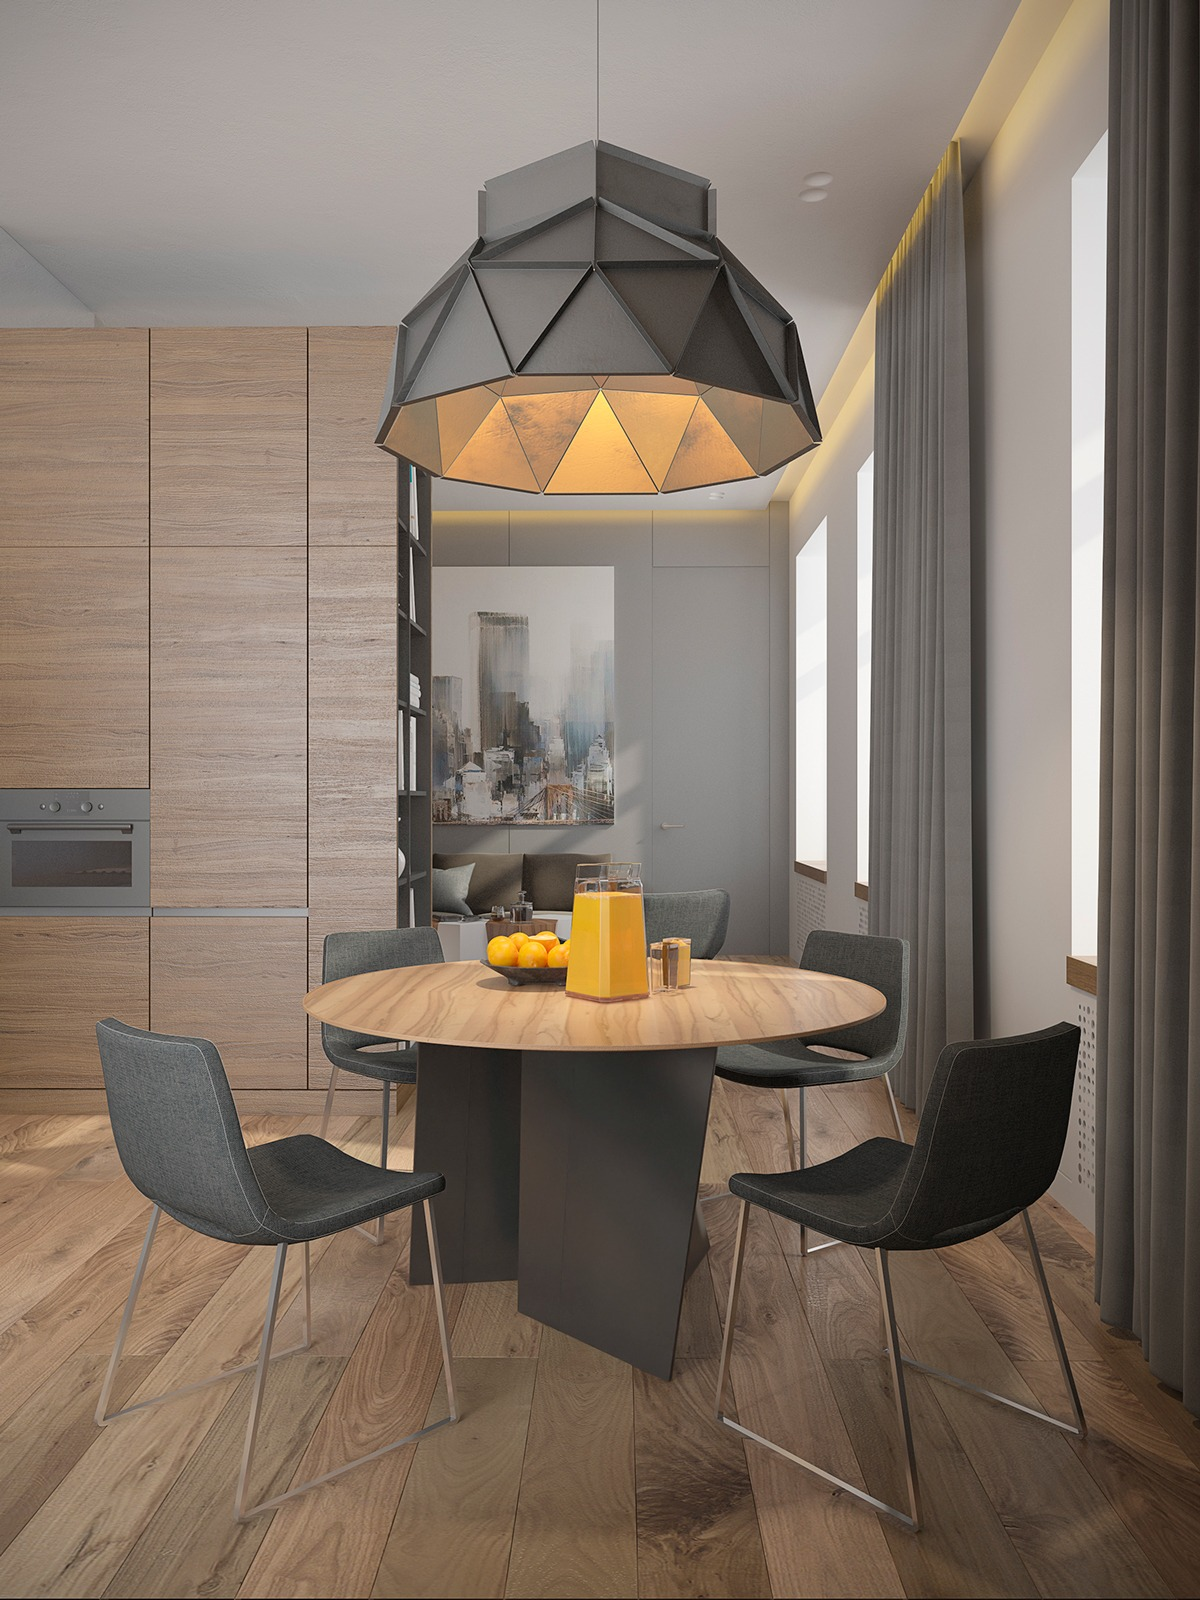 Room Decor: 3 One-Bedroom Homes With Sharp Geometric Decor